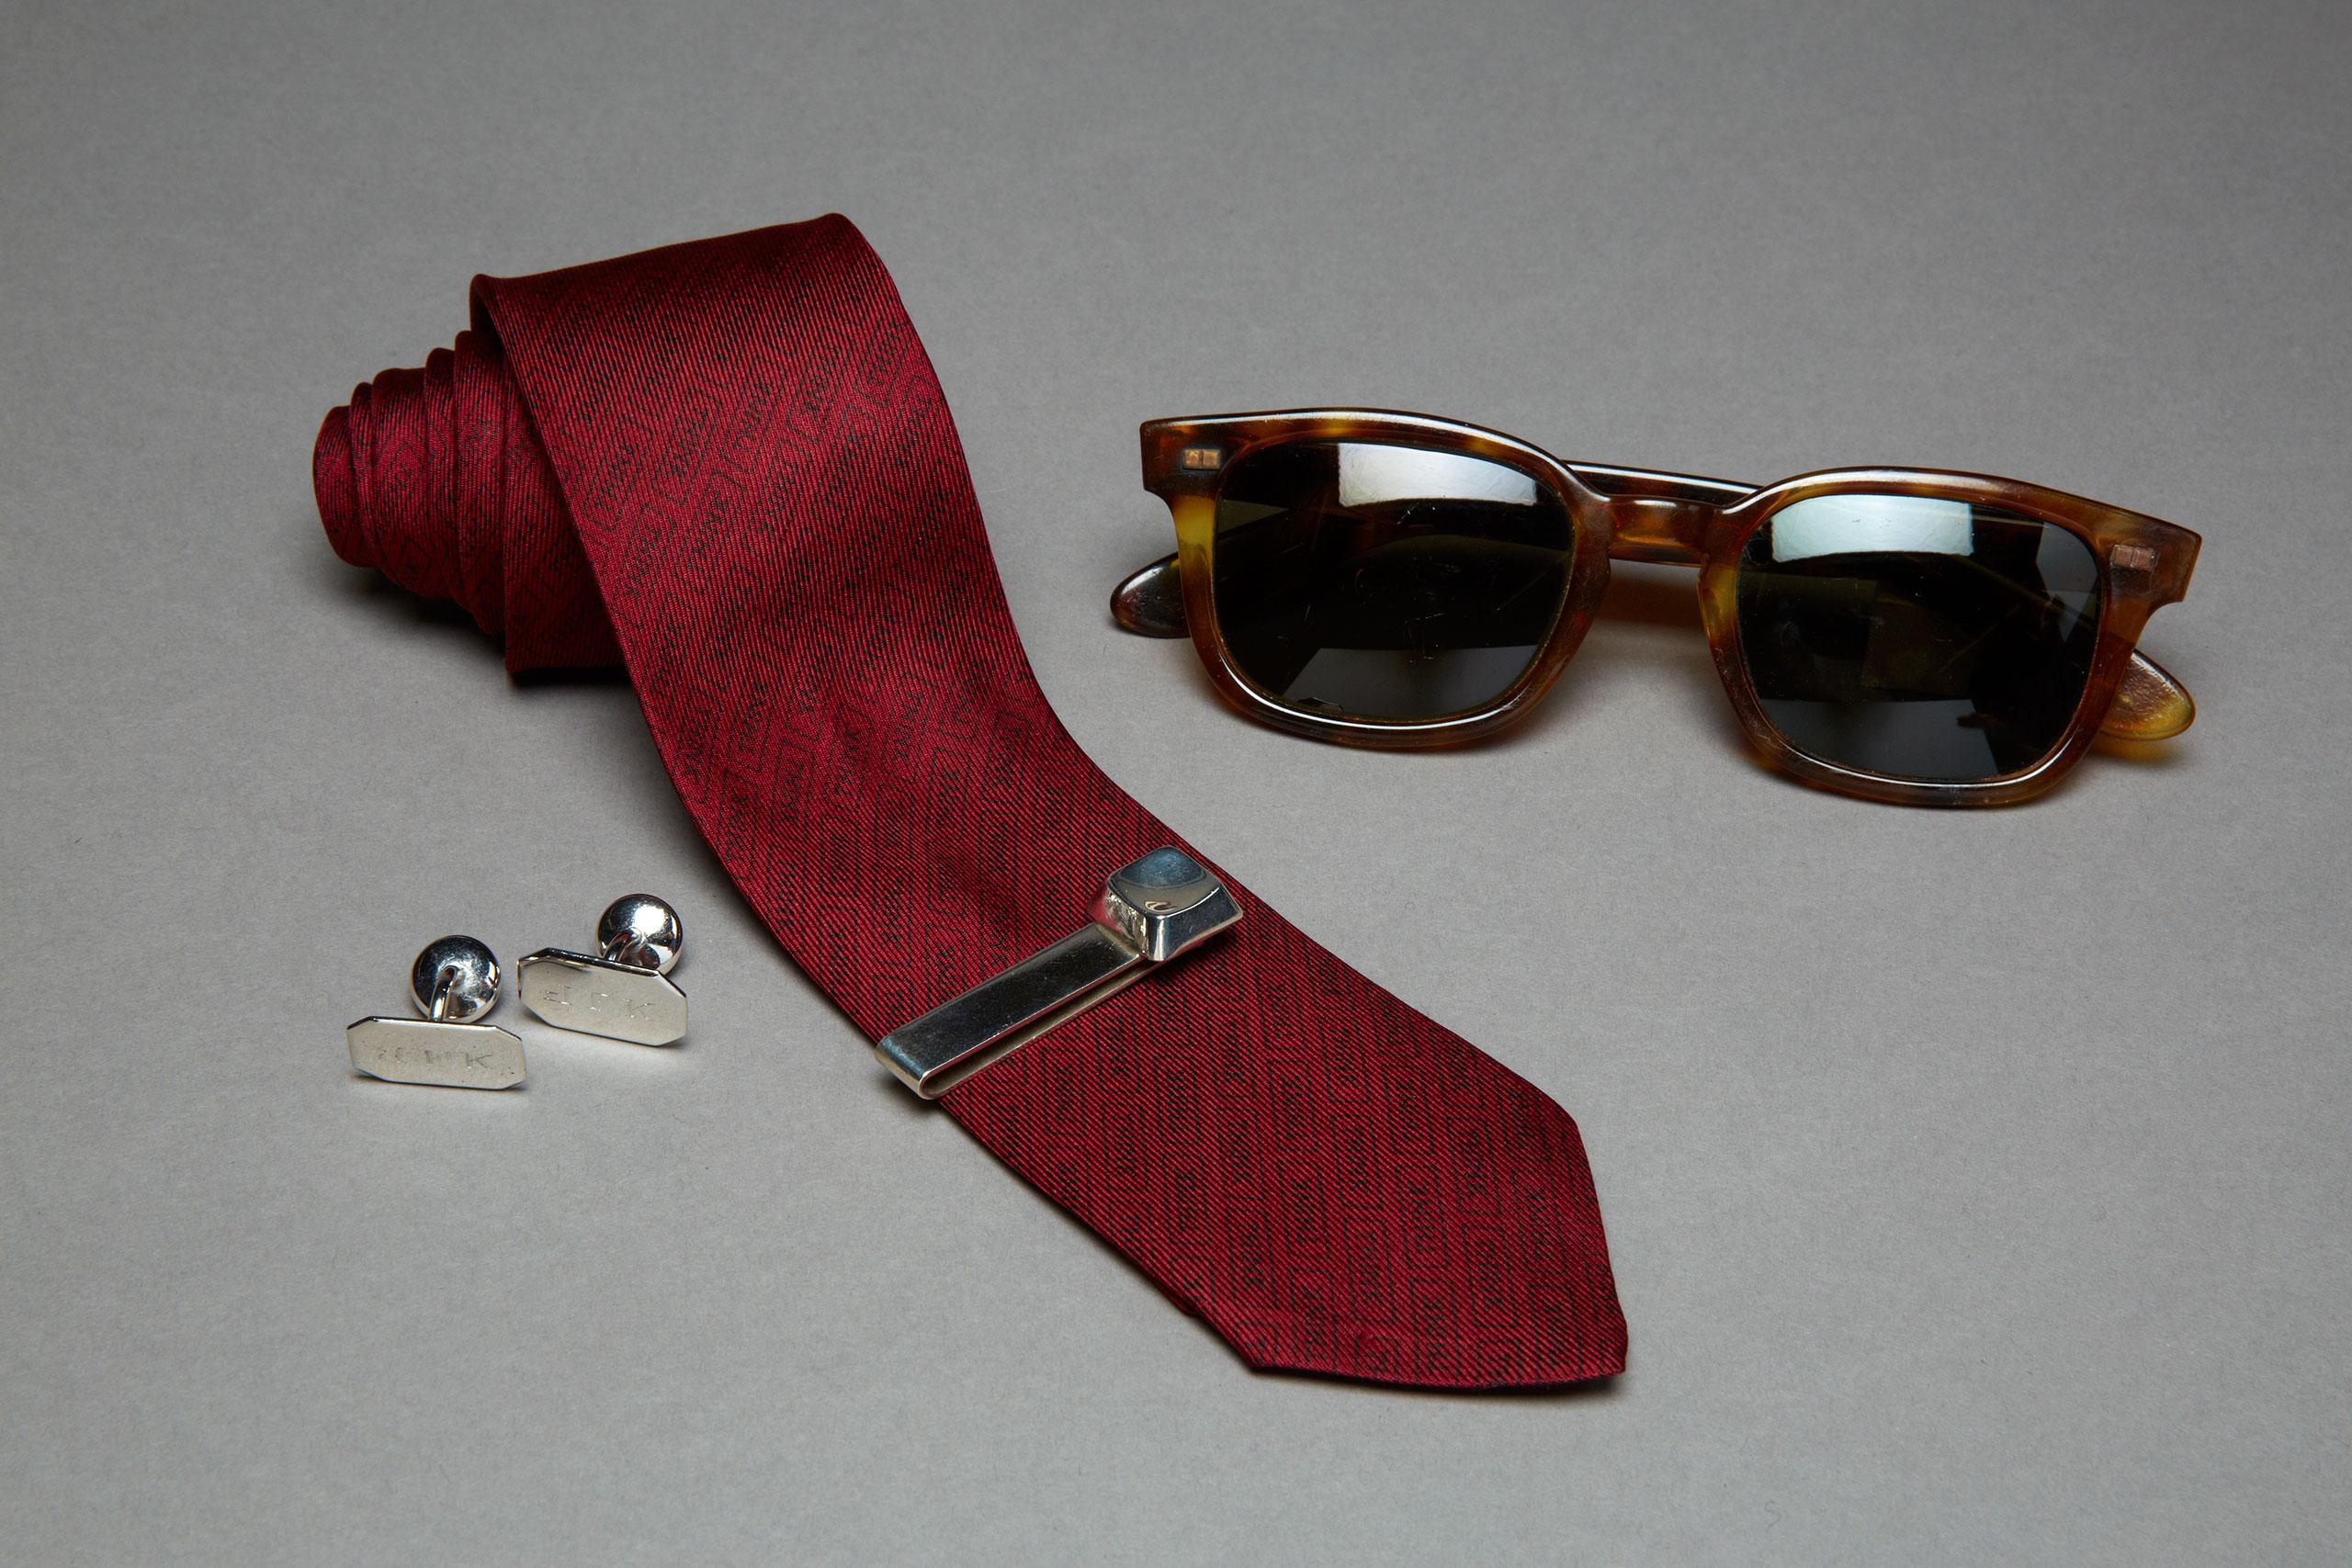 JFK's sunglasses, cuff links, tie clip and tie from JFK's personal wardrobe.